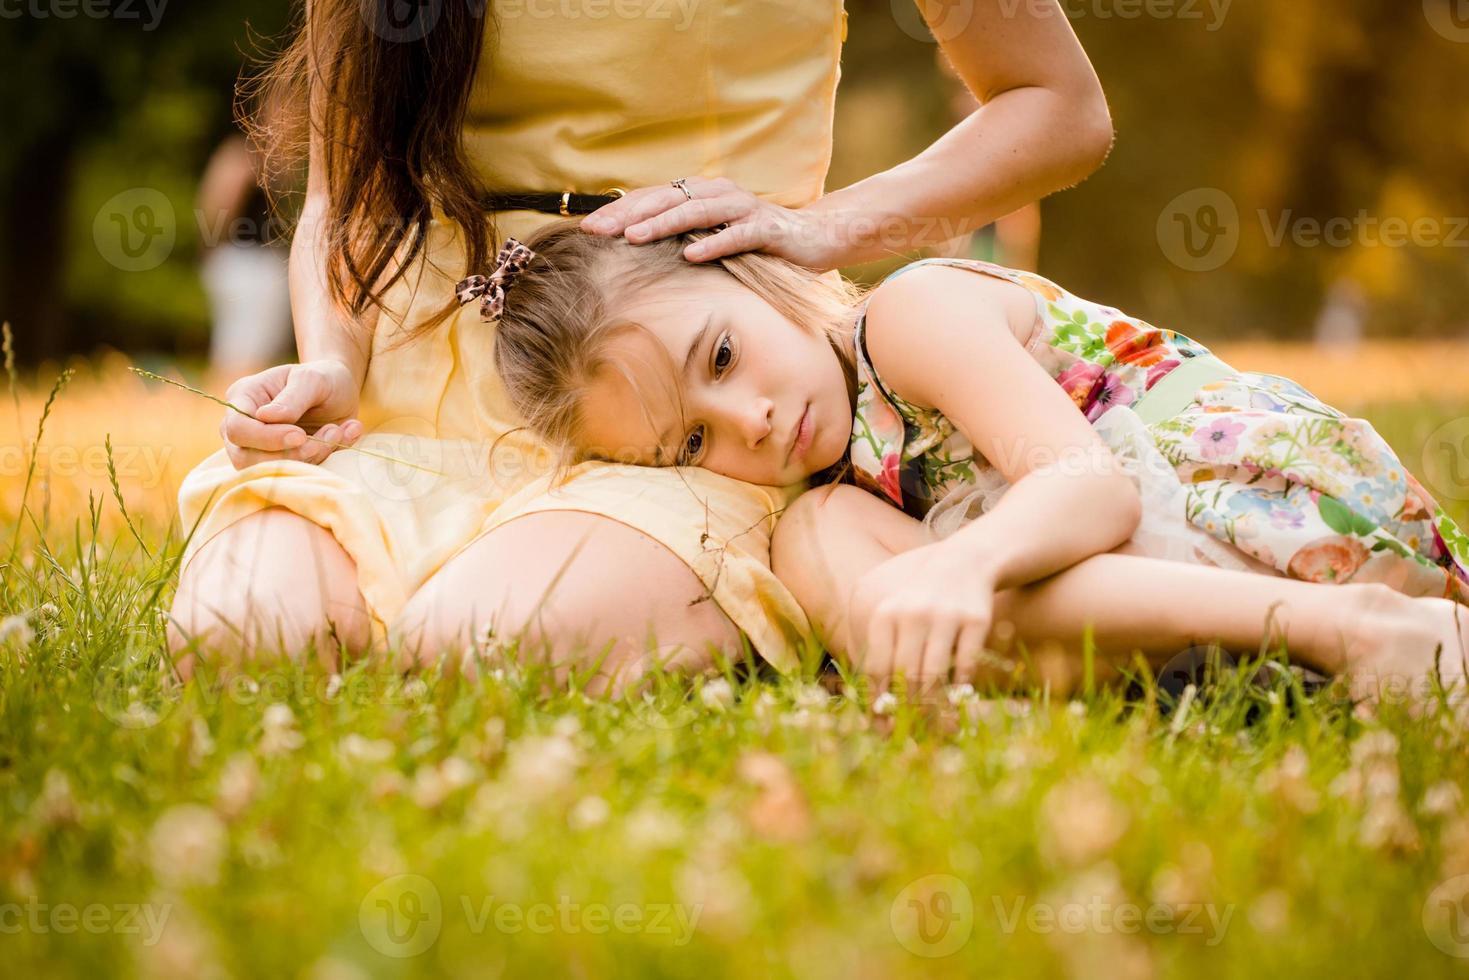 Worries of childhood photo